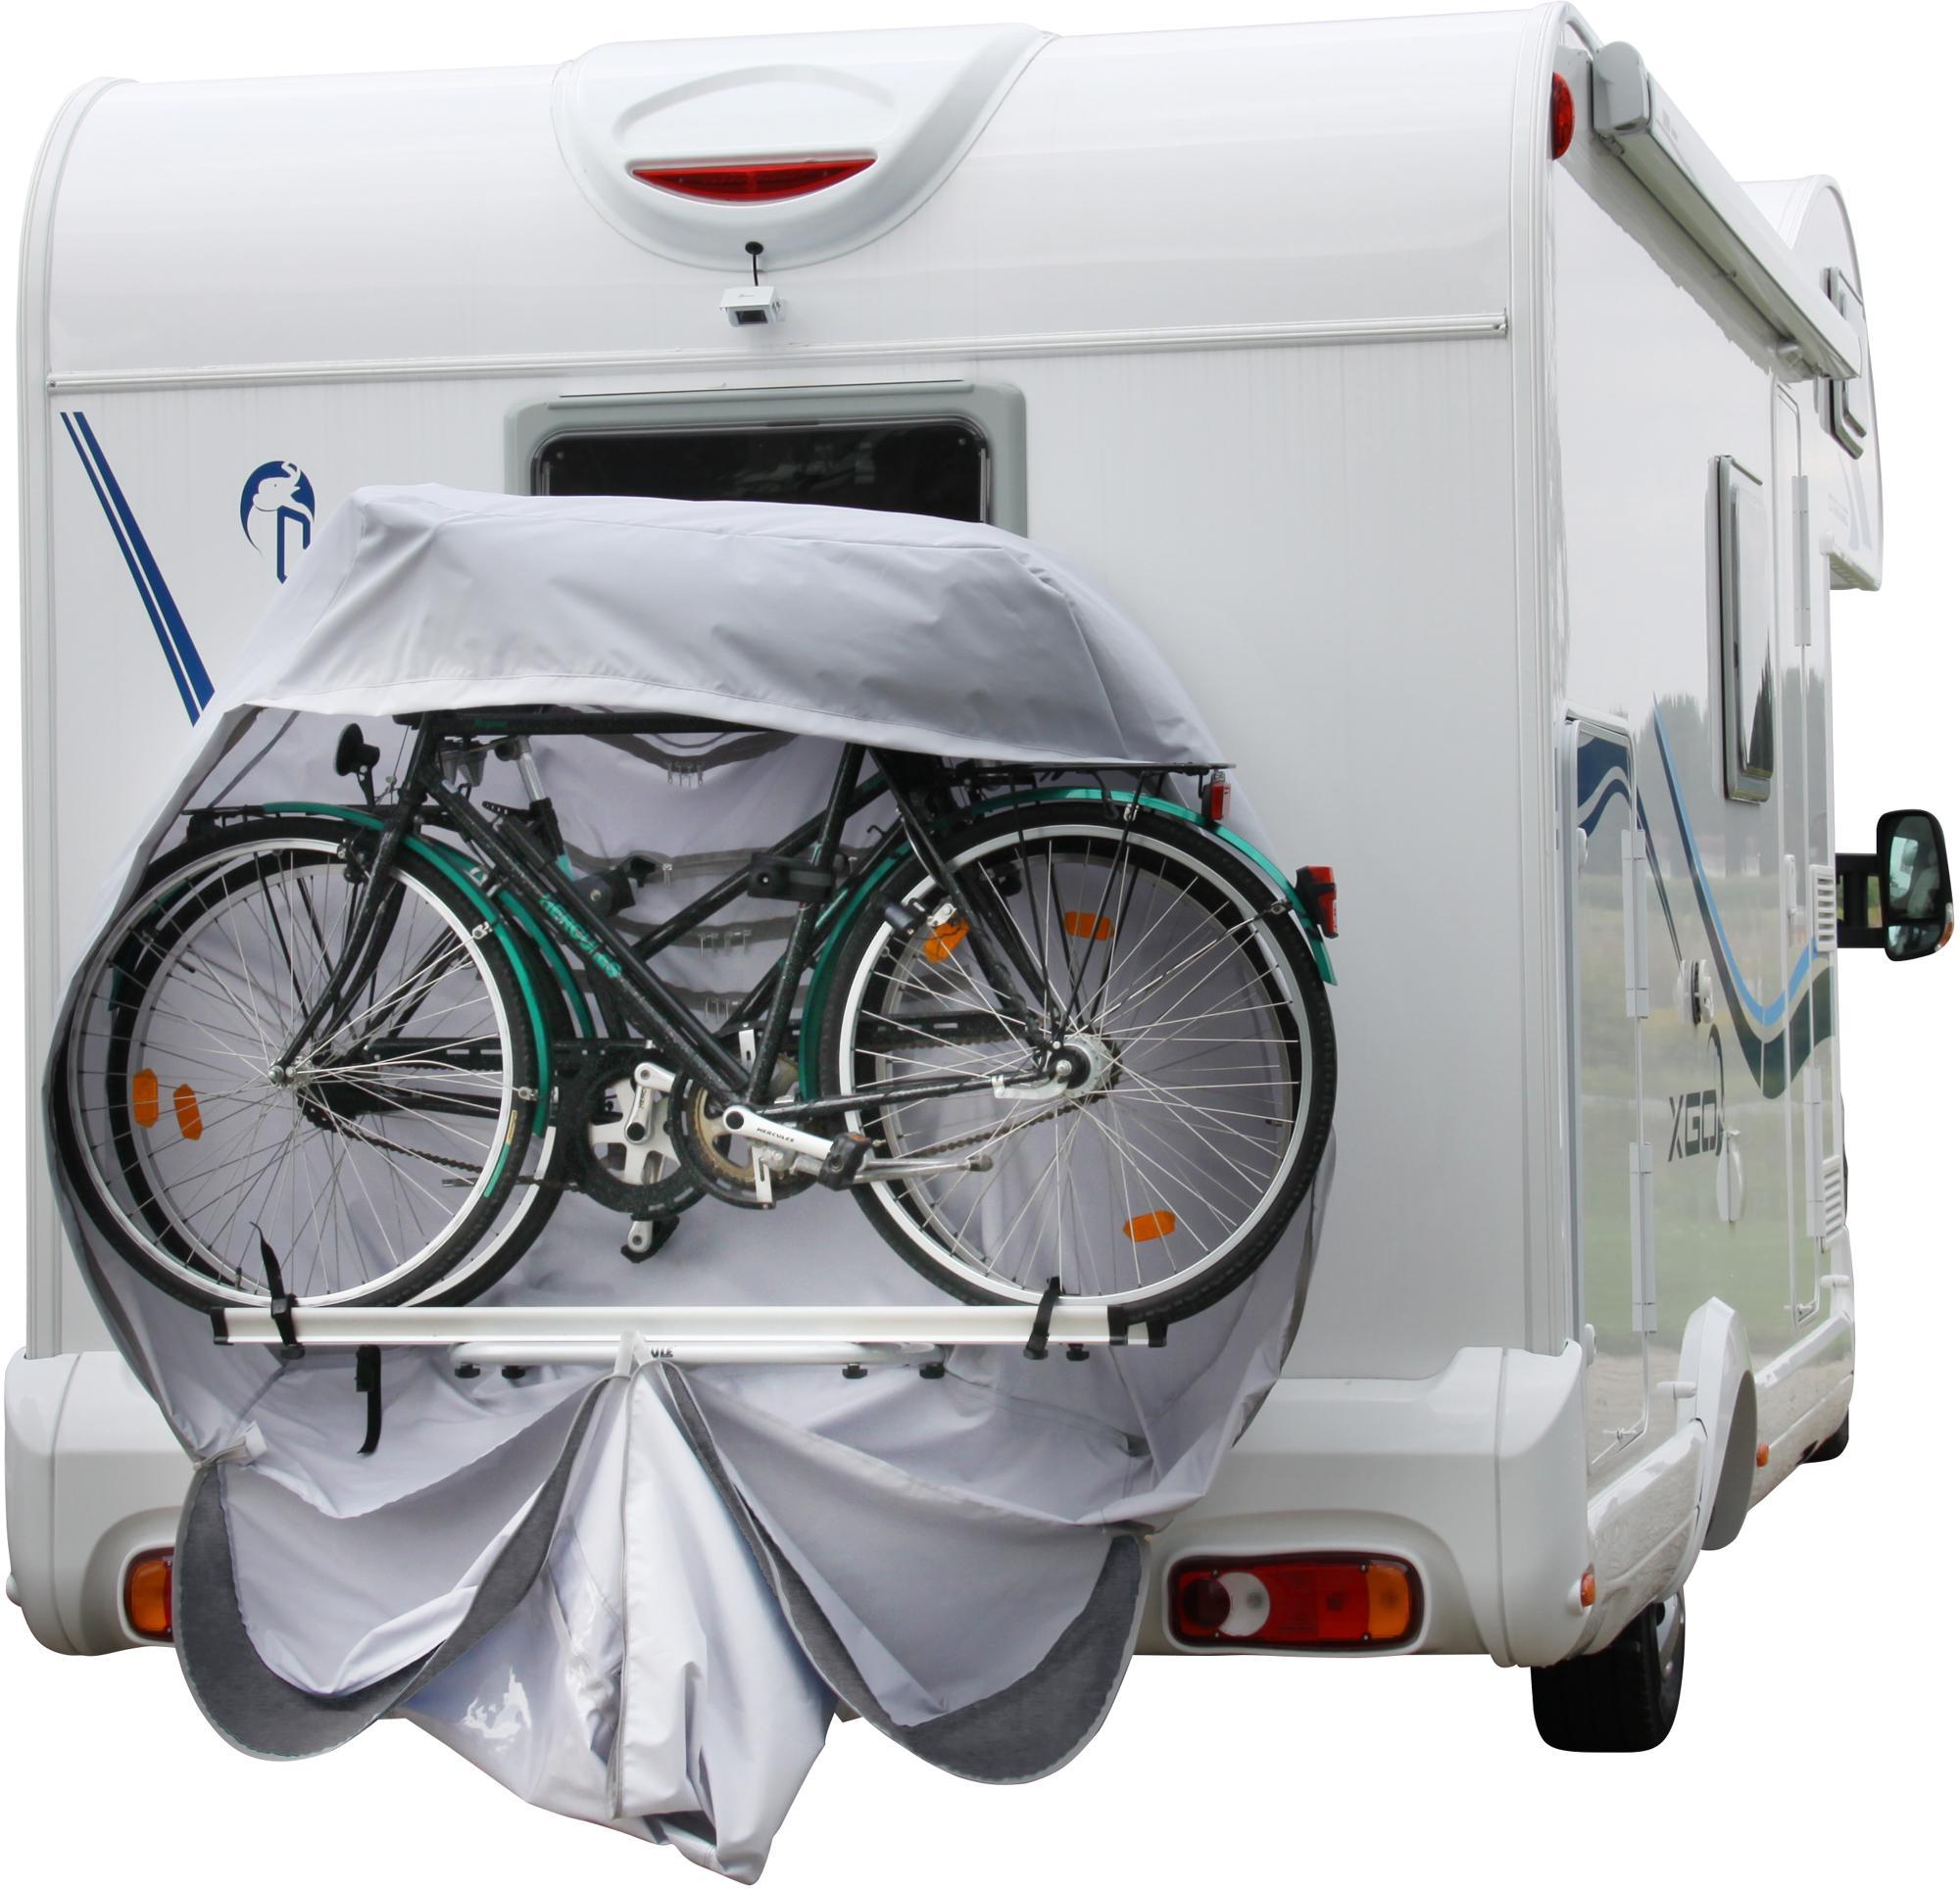 fahrradschutzh lle hindermann concept zwoo f r 2 e bikes. Black Bedroom Furniture Sets. Home Design Ideas